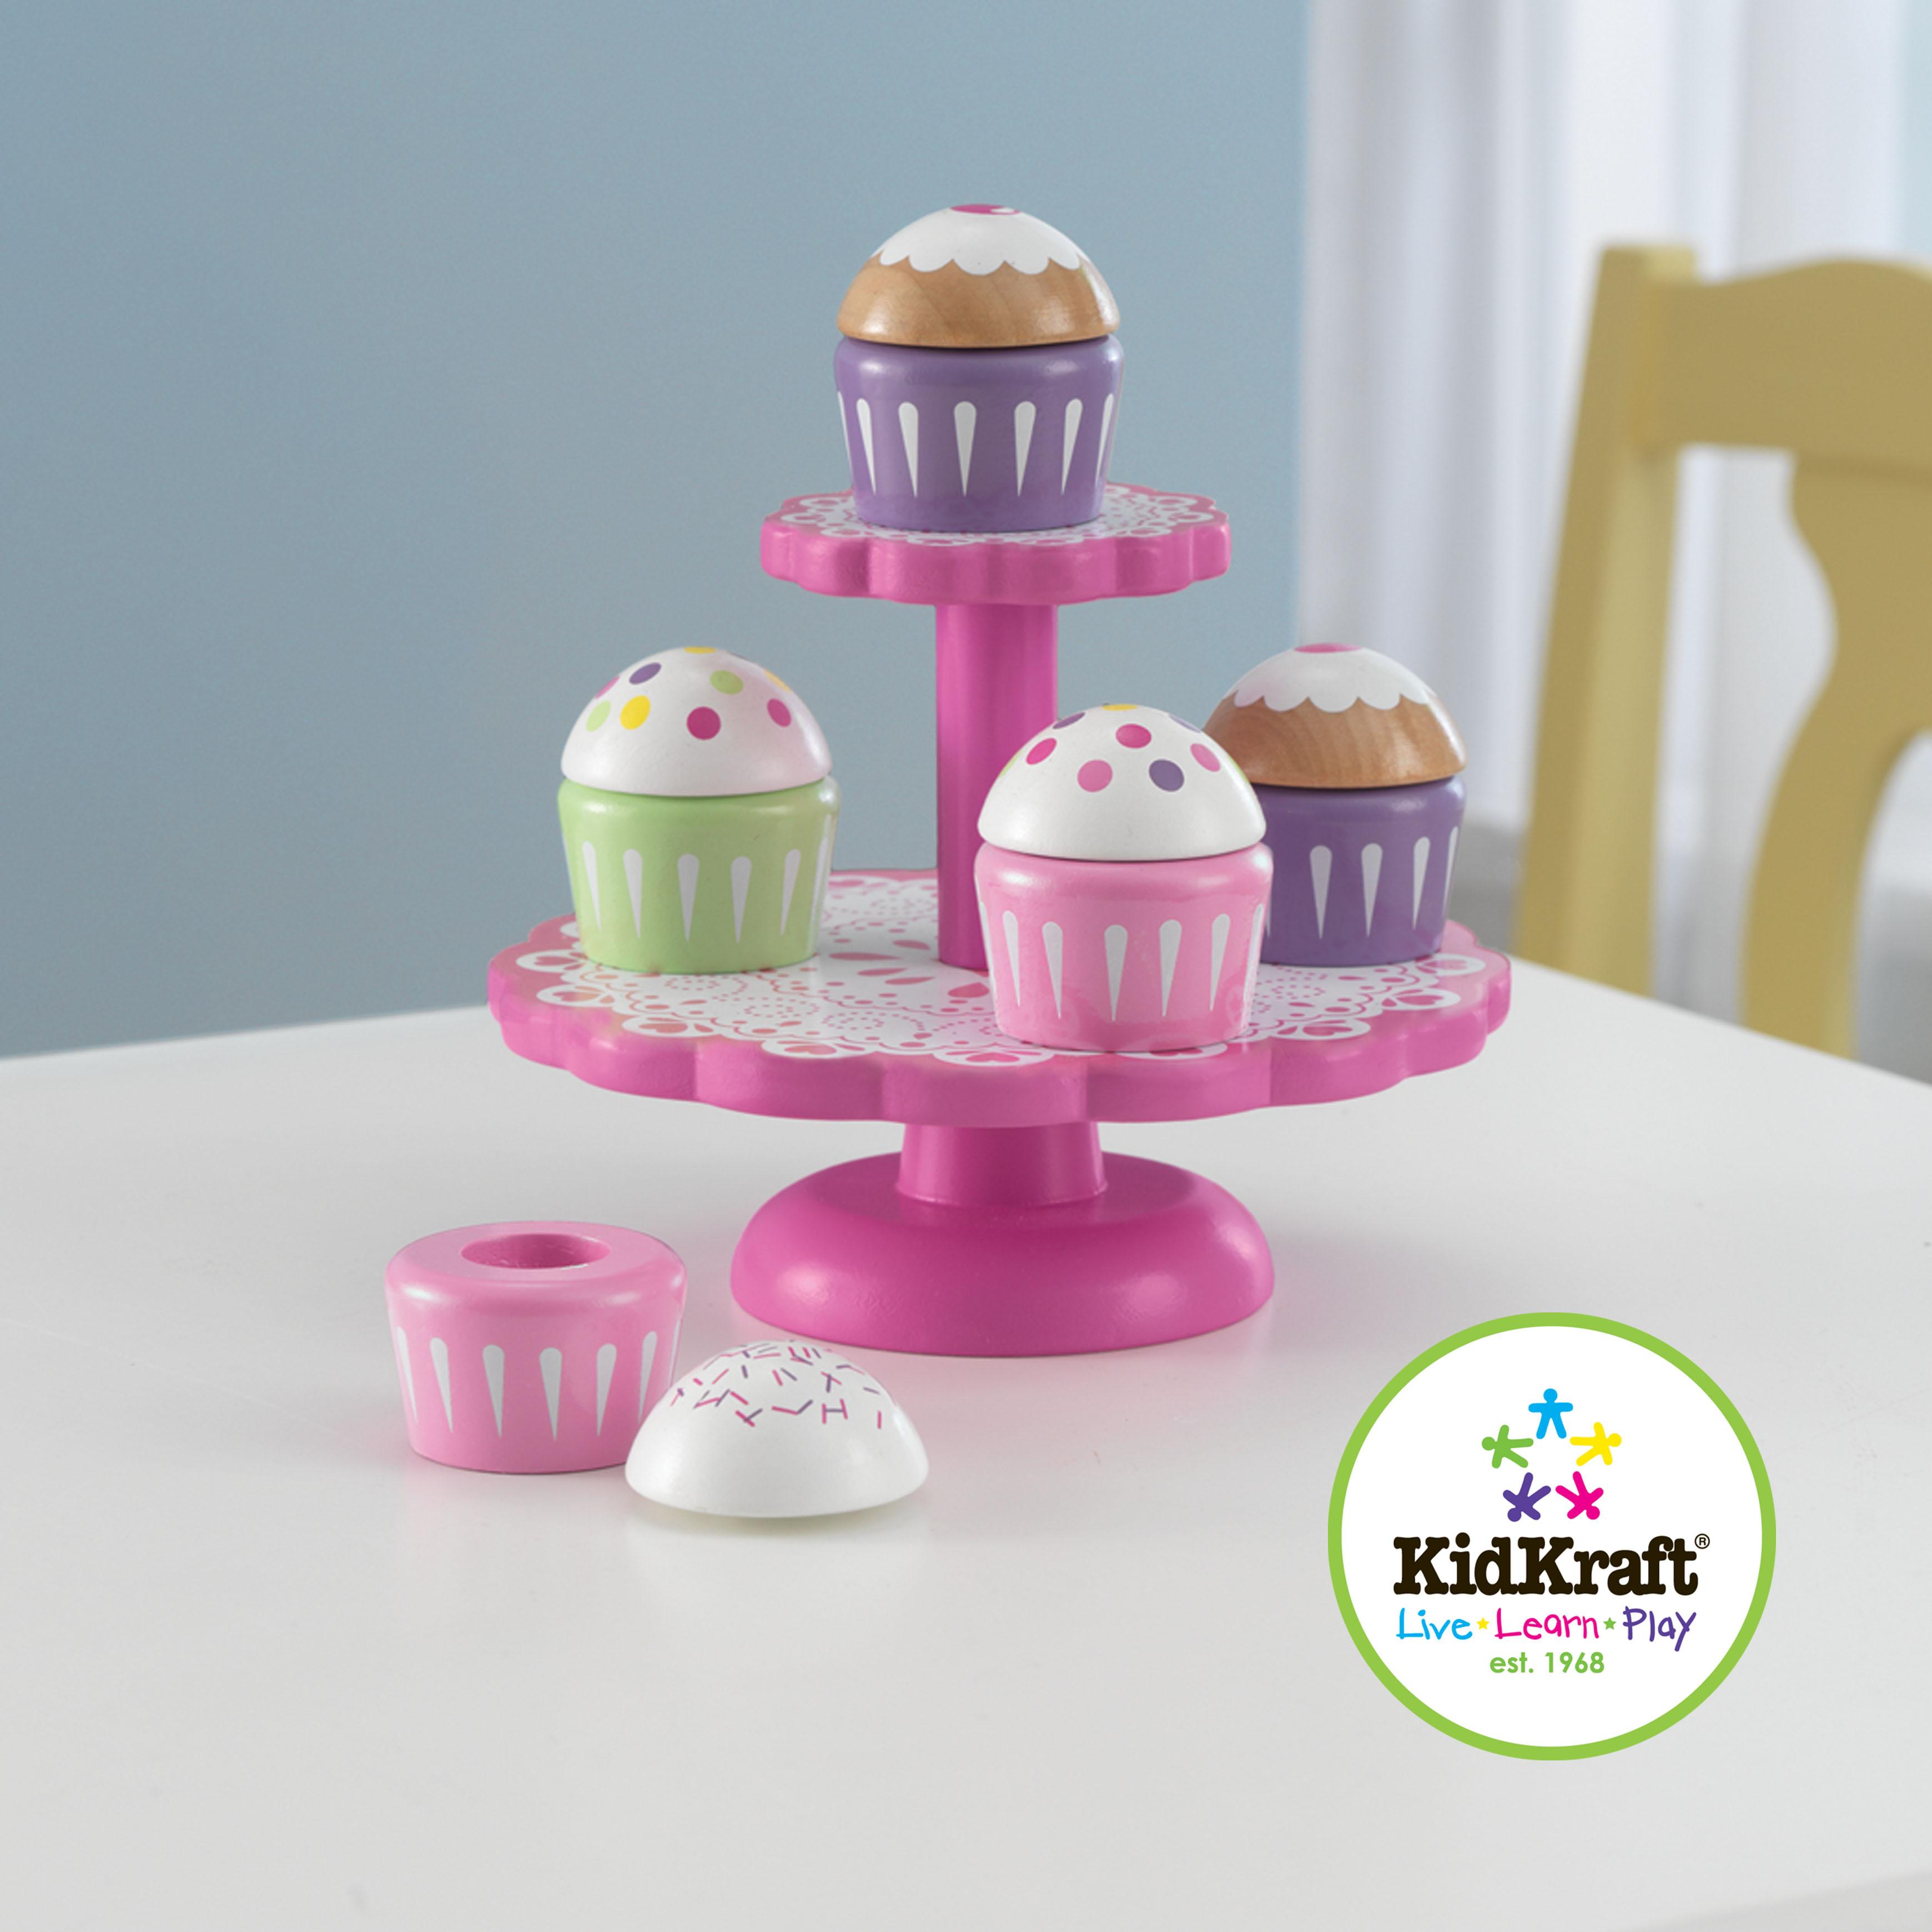 KidKraft Cupcake Stand with Cupcakes